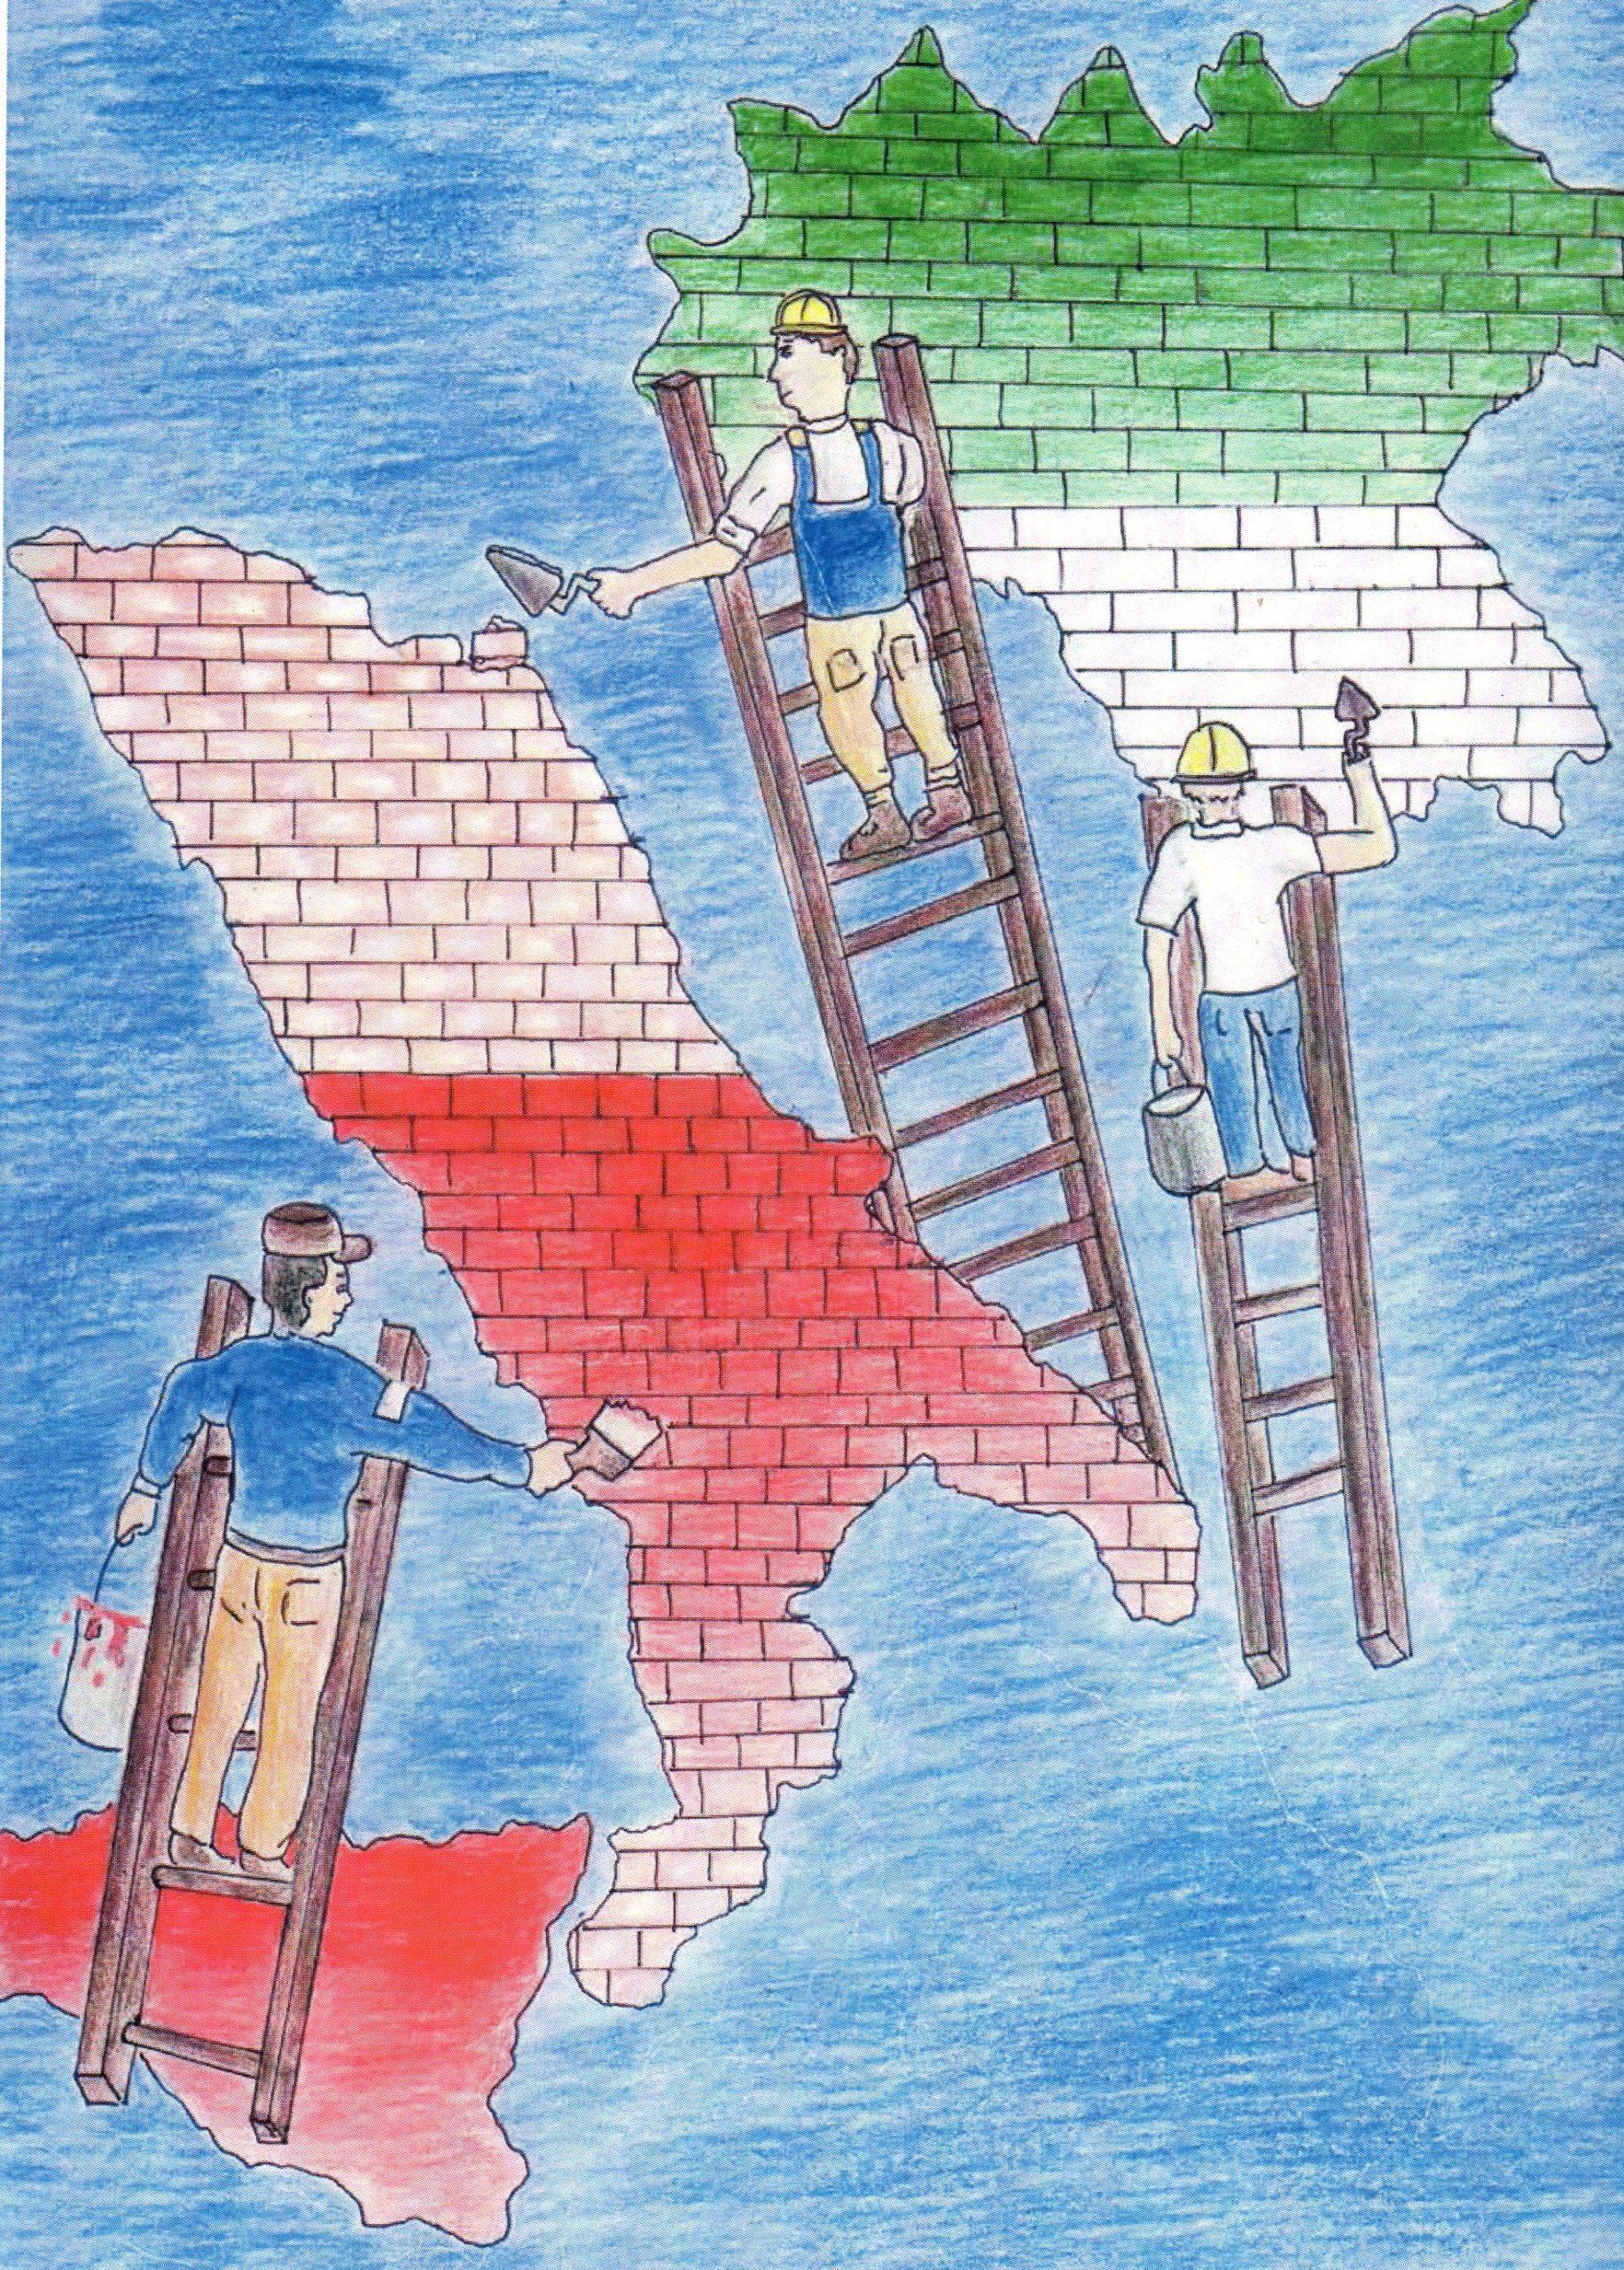 Costruire cittadinanza